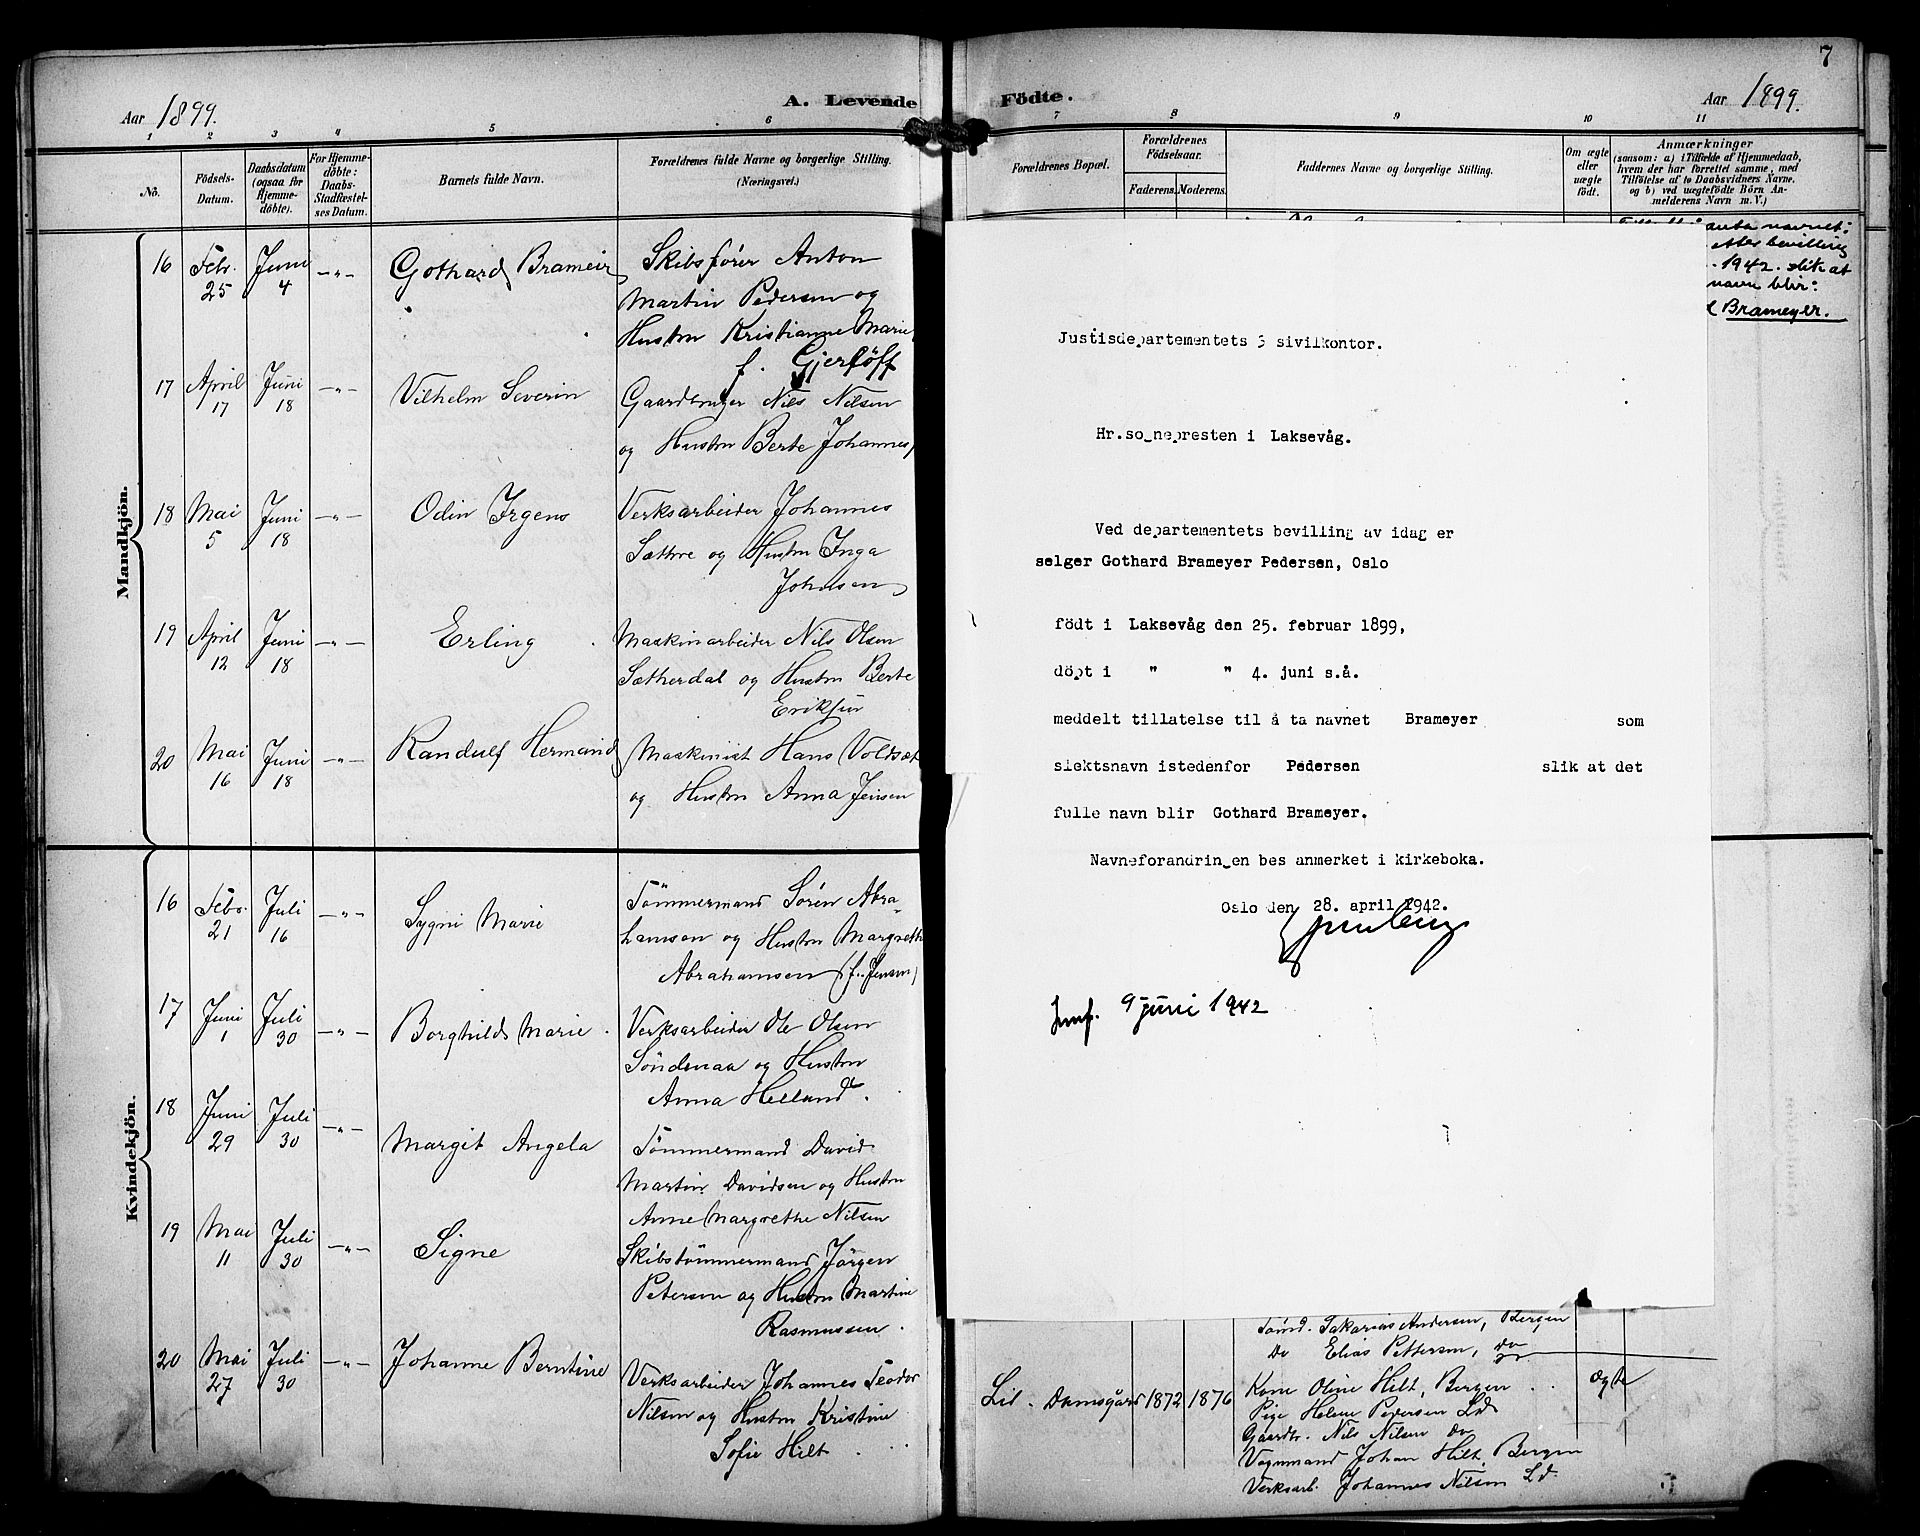 SAB, Laksevåg Sokneprestembete, H/Ha/Hab/Haba/L0004: Klokkerbok nr. A 4, 1899-1909, s. 7